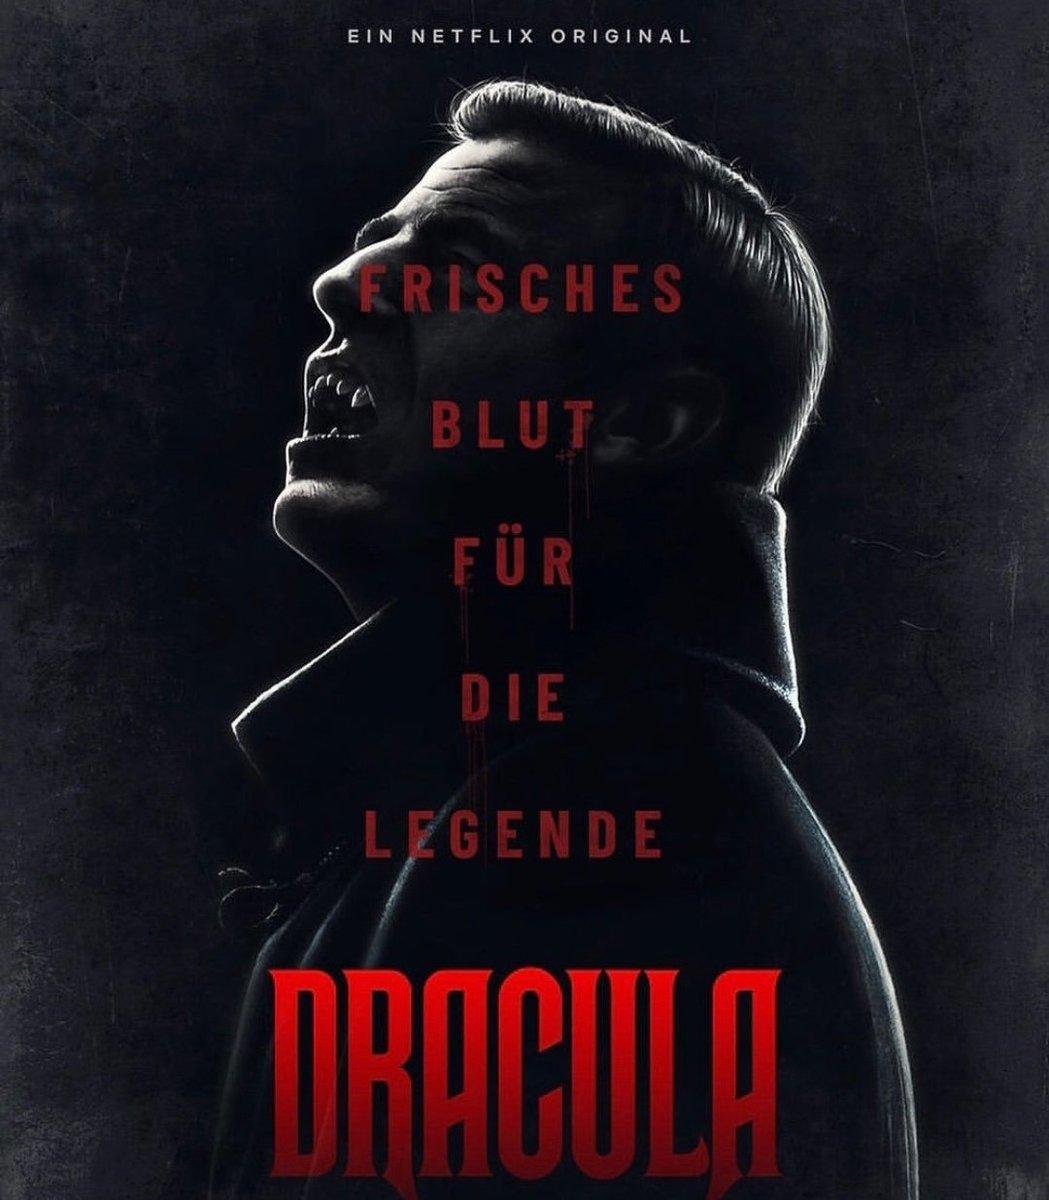 #DraculaNetflix